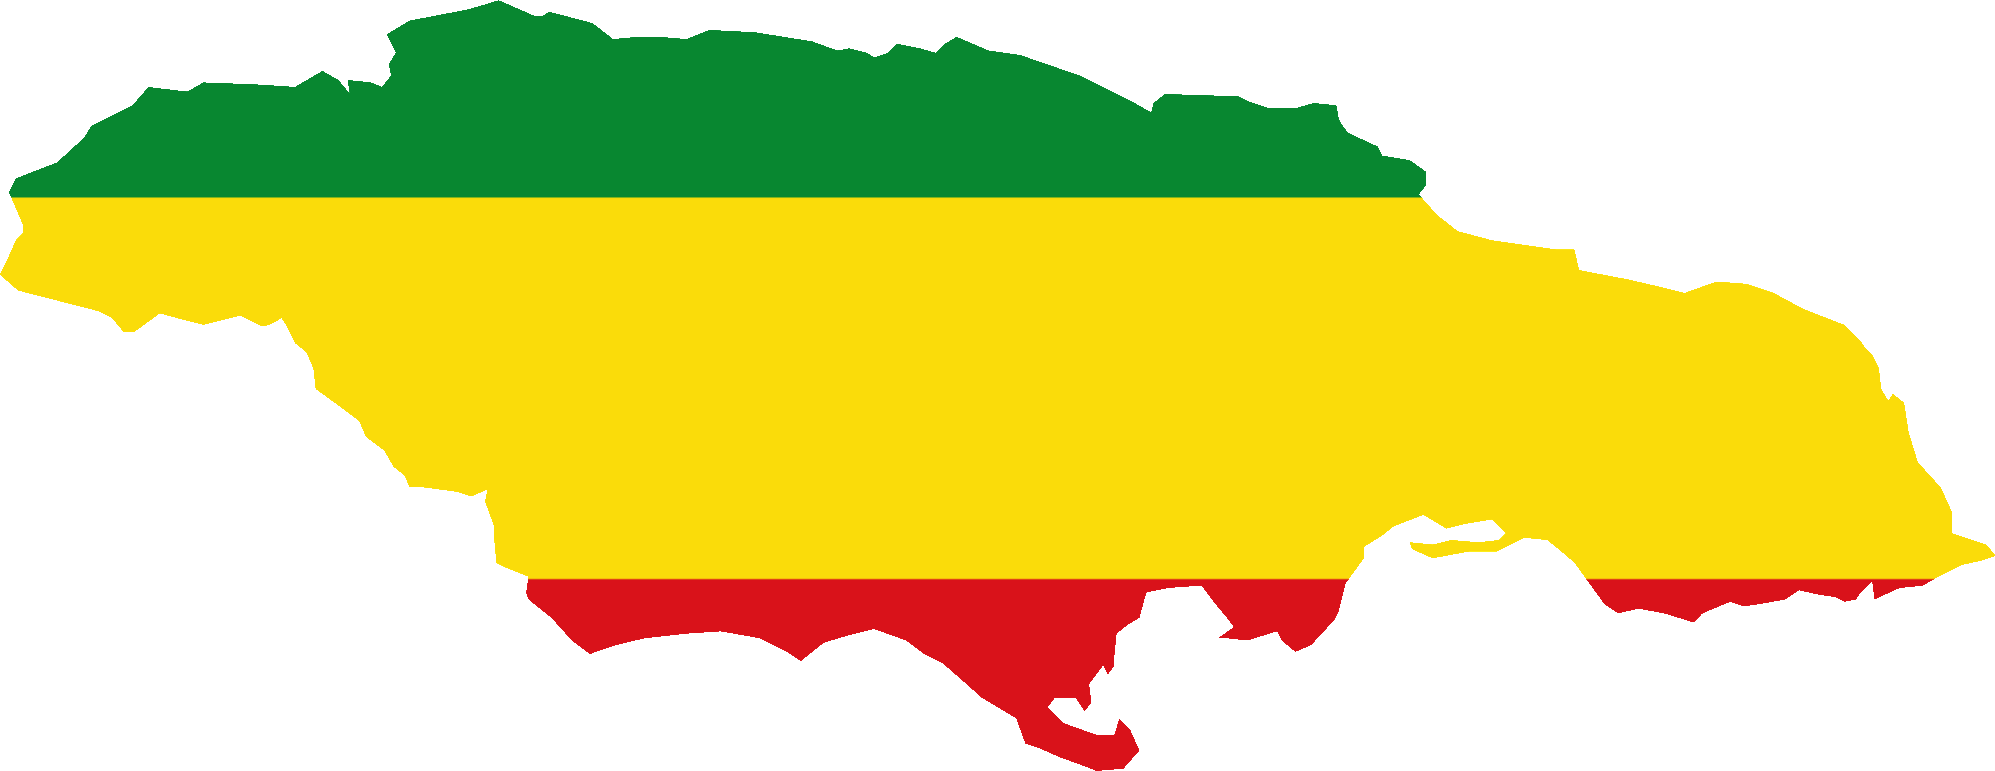 Jamaica PNG - 20600